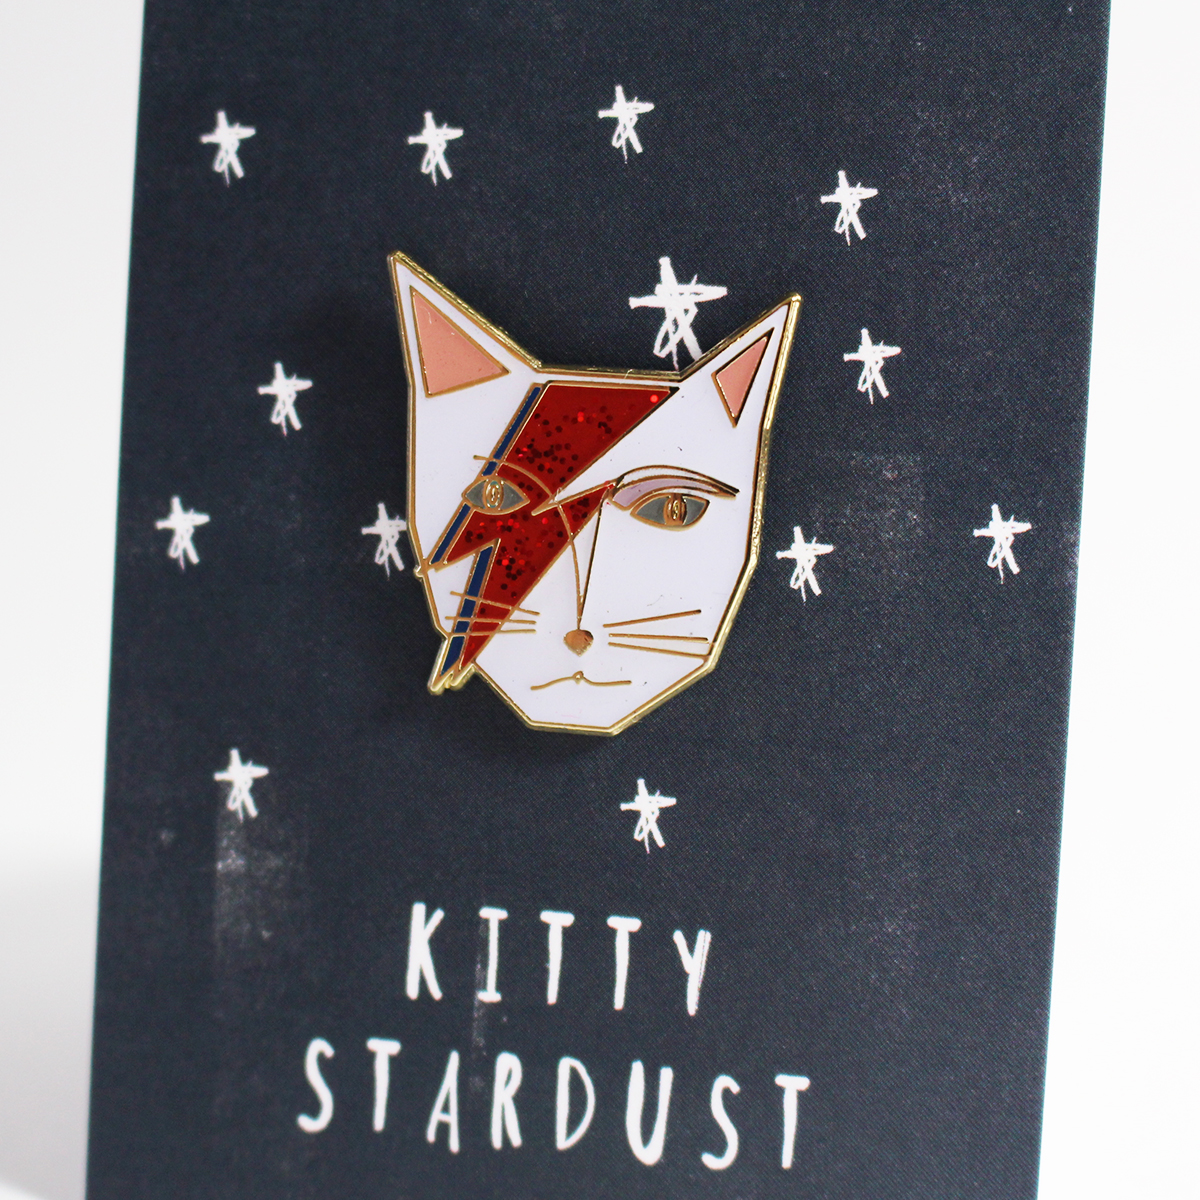 Kitty Stardust - Ziggy Stardust